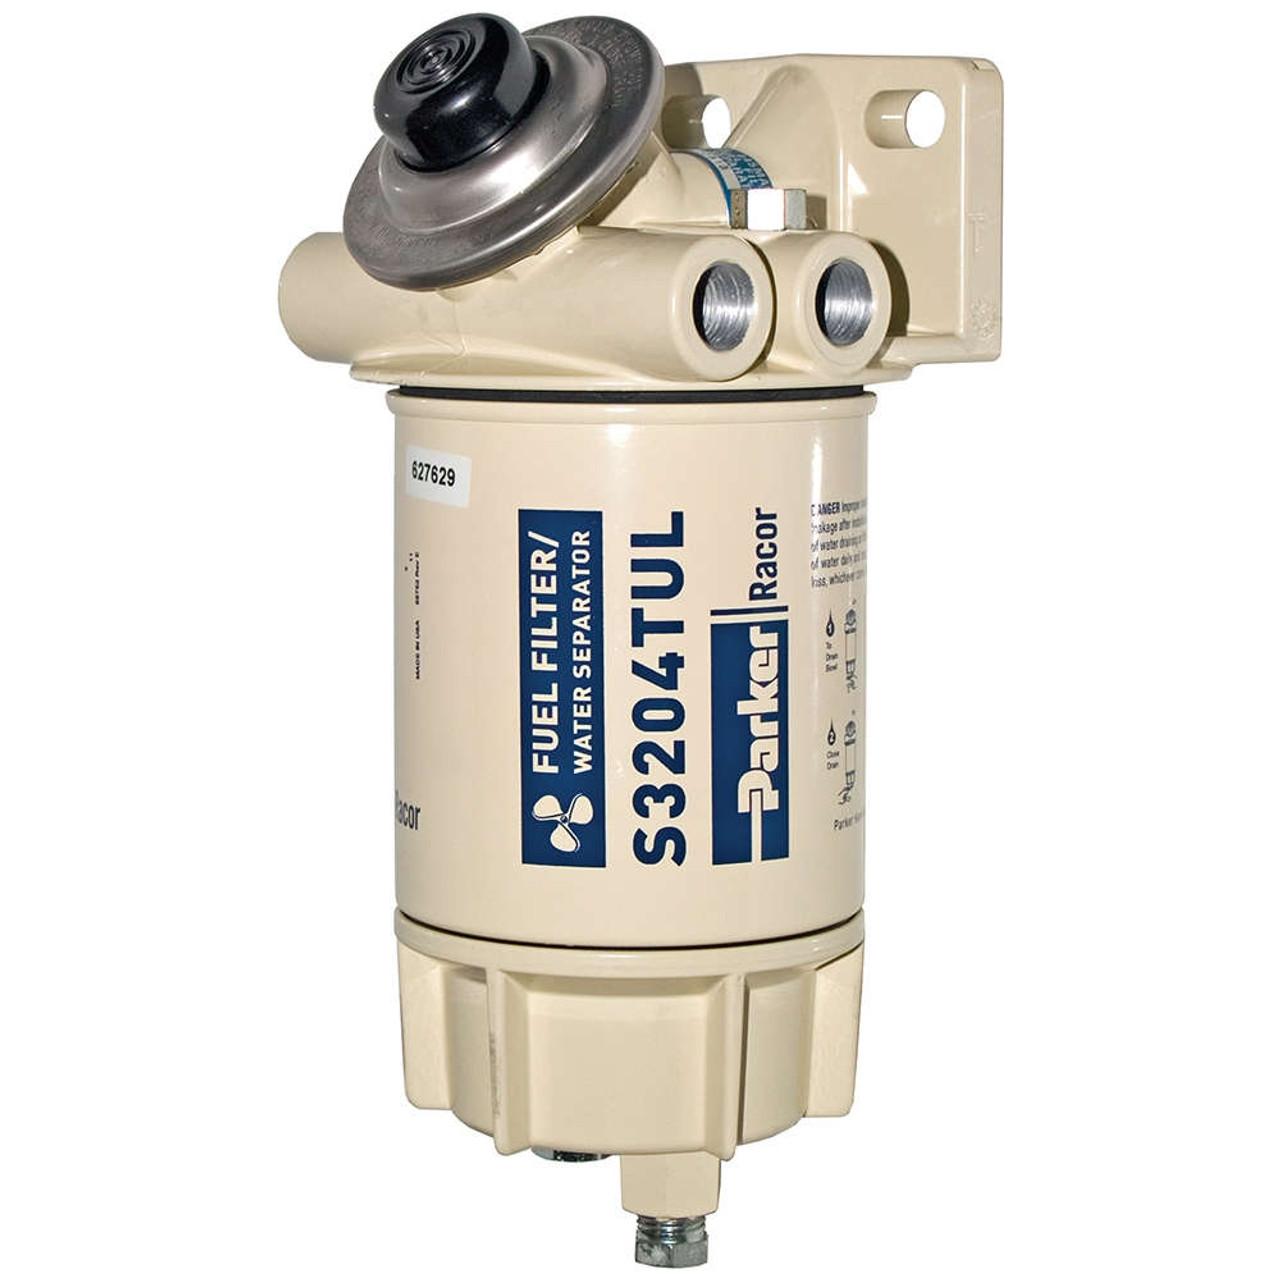 racor aquabloc marine 3 8 in 45 gph spin on diesel fuel filter water separator assembly 6 qty john m ellsworth co inc  [ 1280 x 1280 Pixel ]